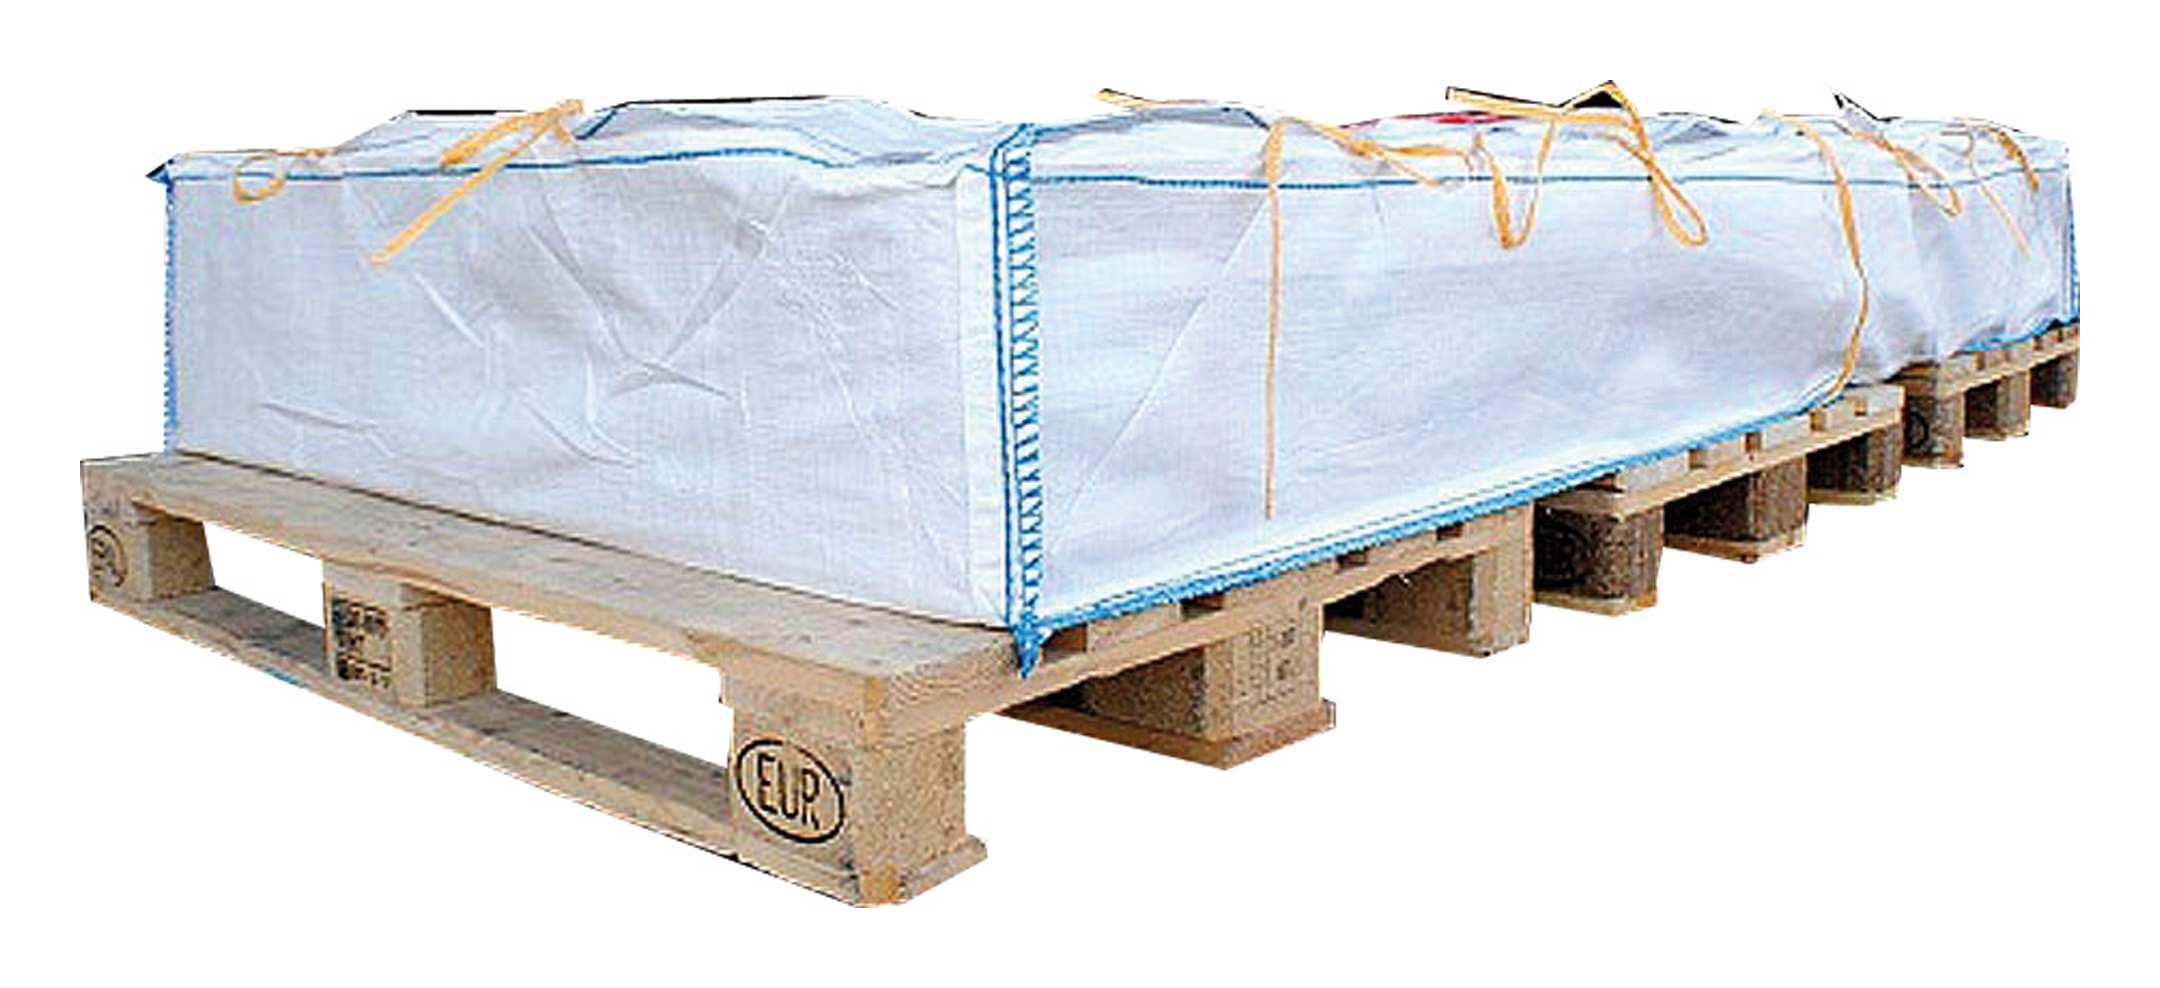 becker big bag asbest 3200 x 1250 x 300 mm. Black Bedroom Furniture Sets. Home Design Ideas